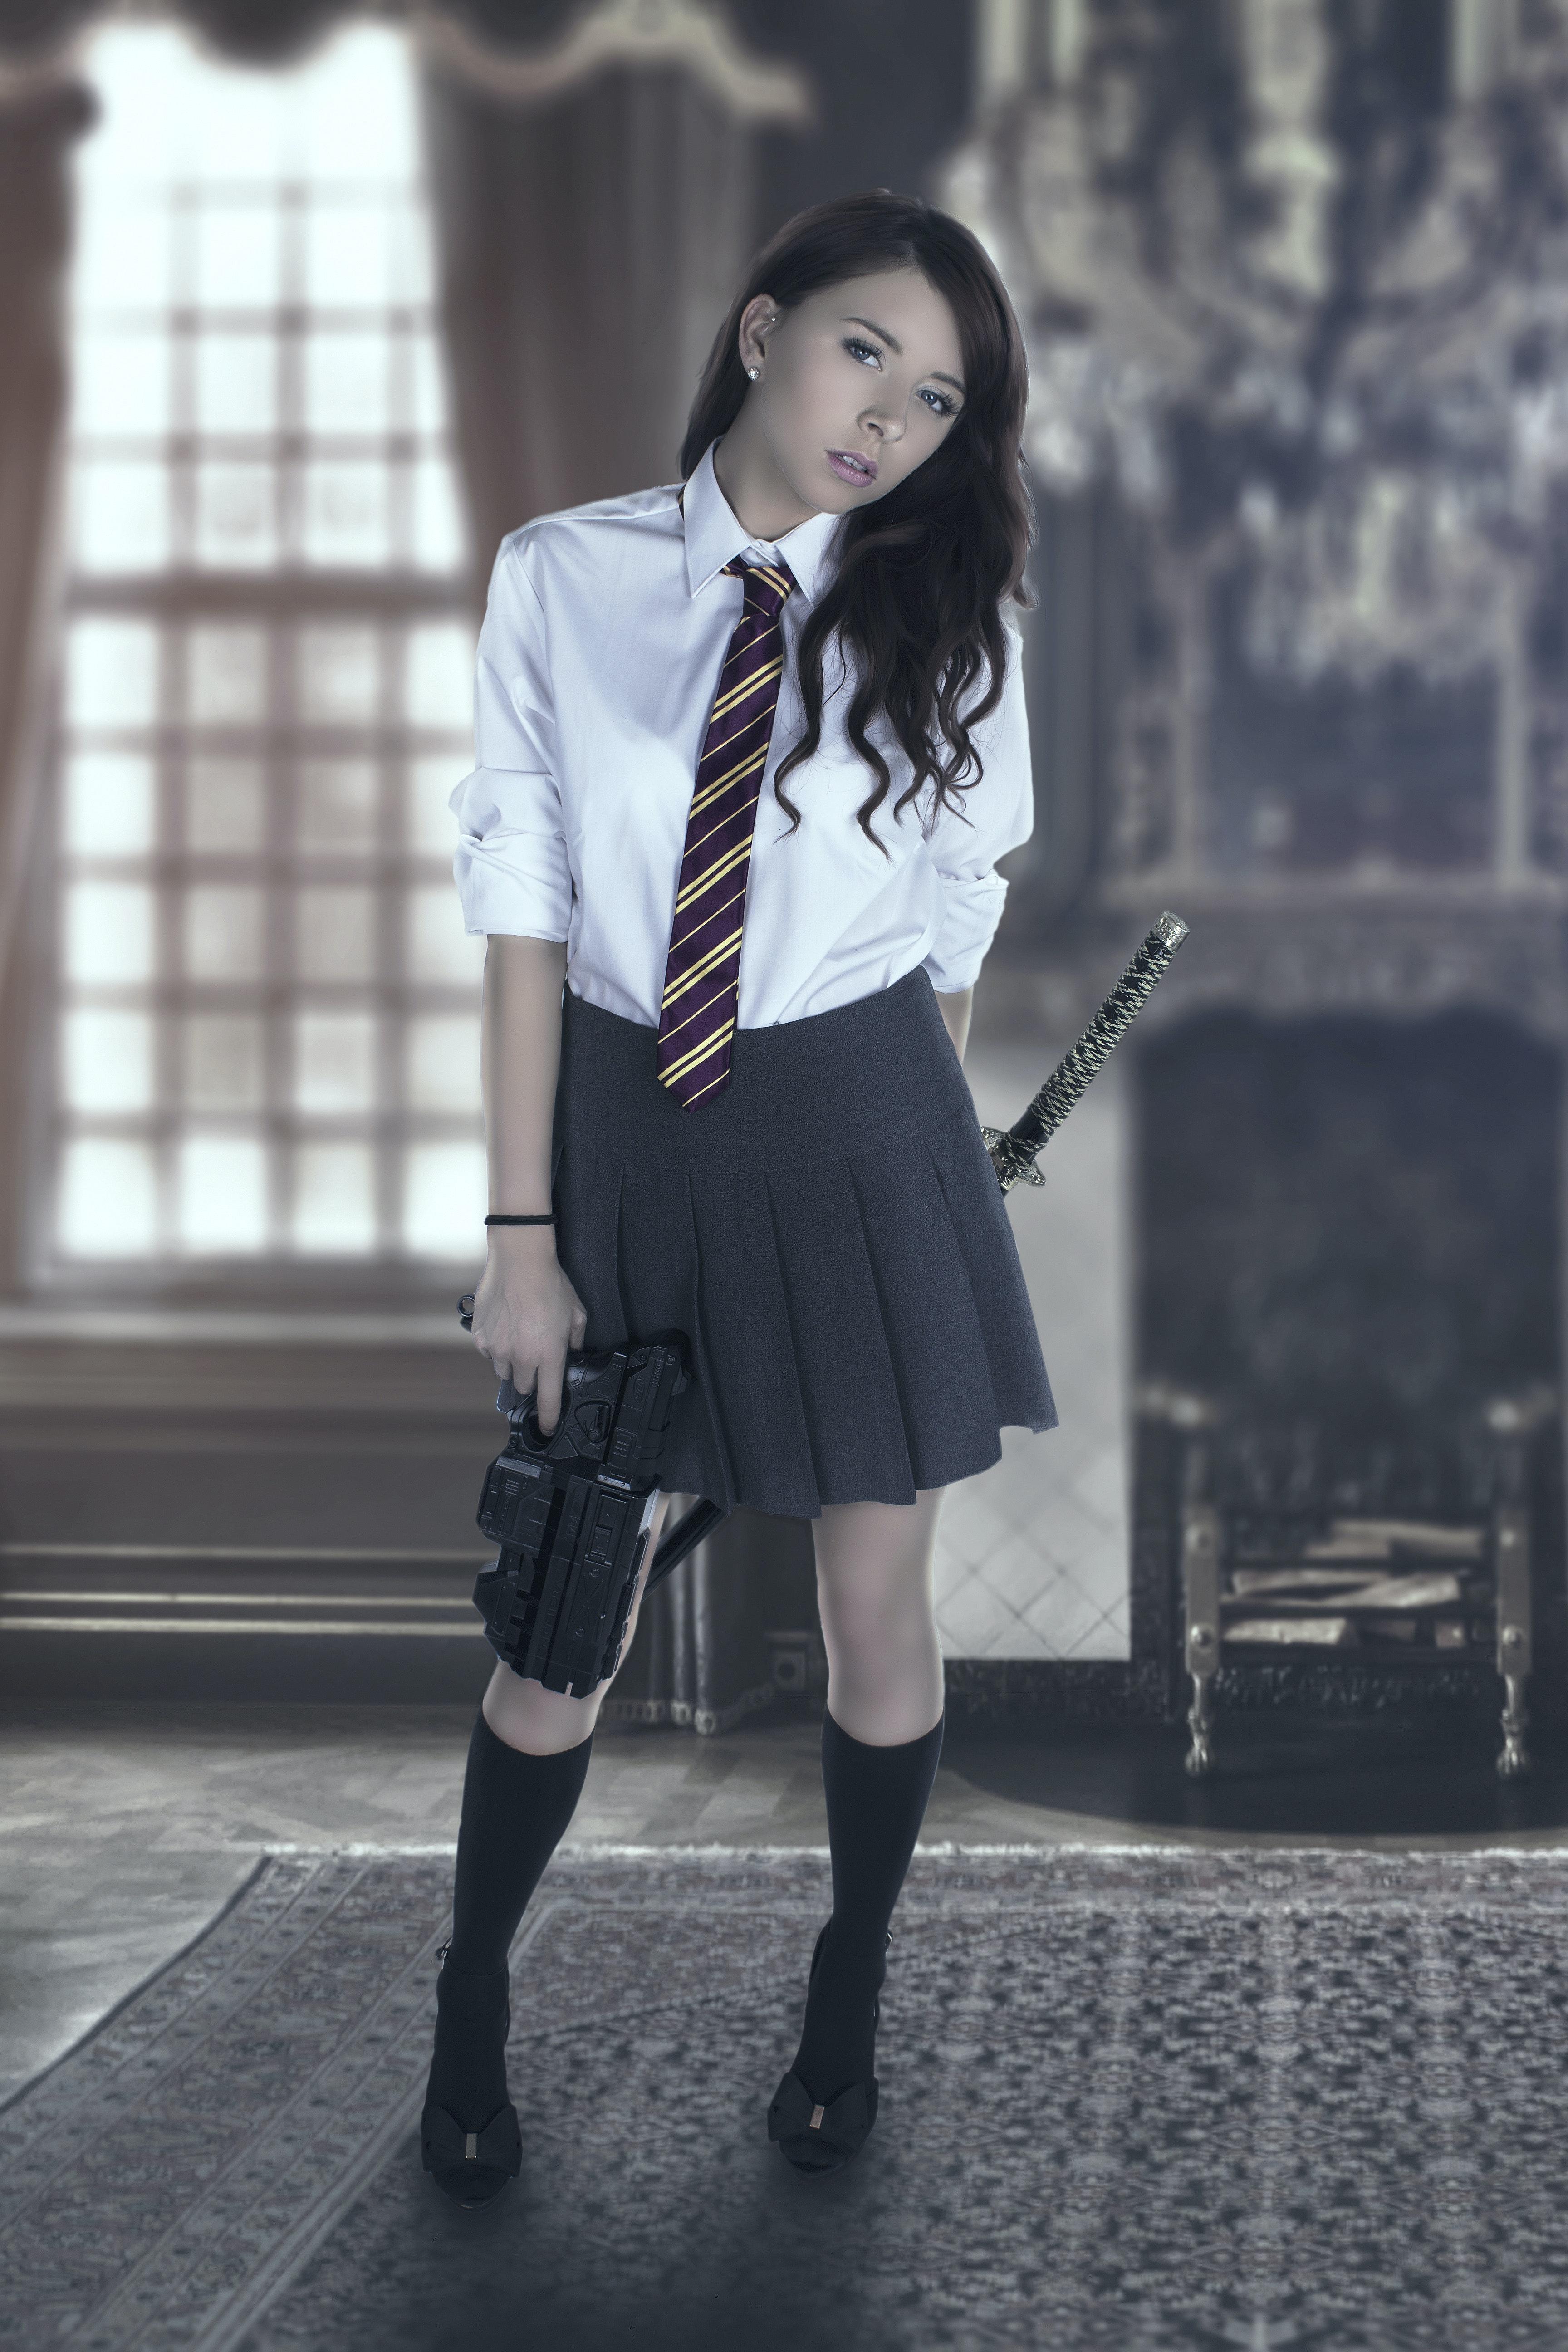 Free stock photo of cosplay, japanese school girl uniform ...